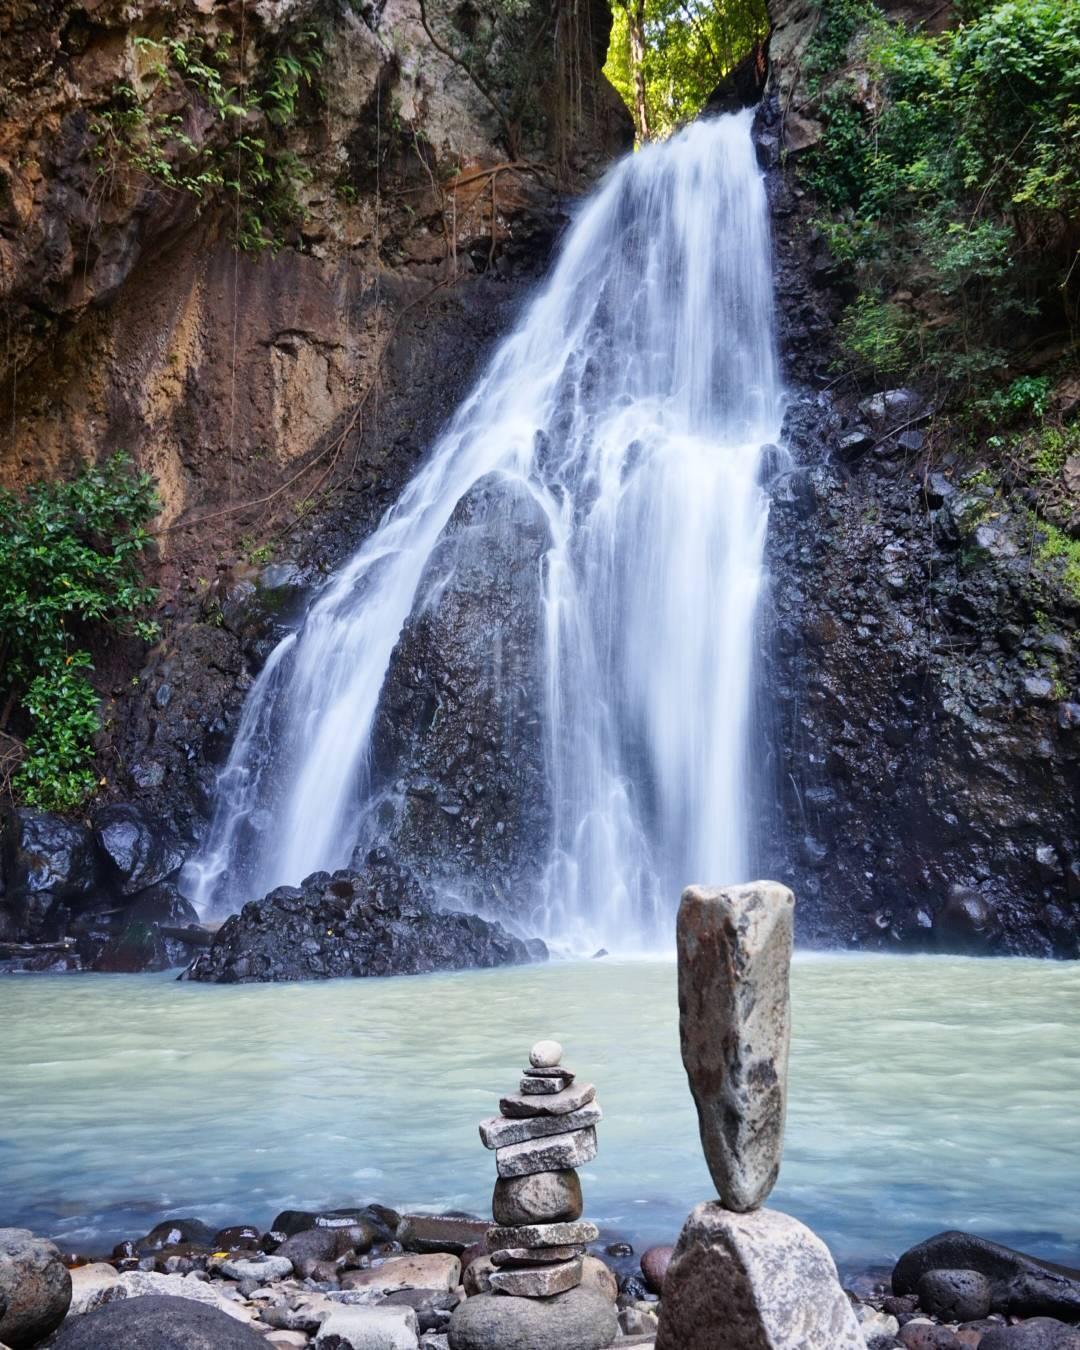 Waterfalls in Bali; SingSing Waterfall